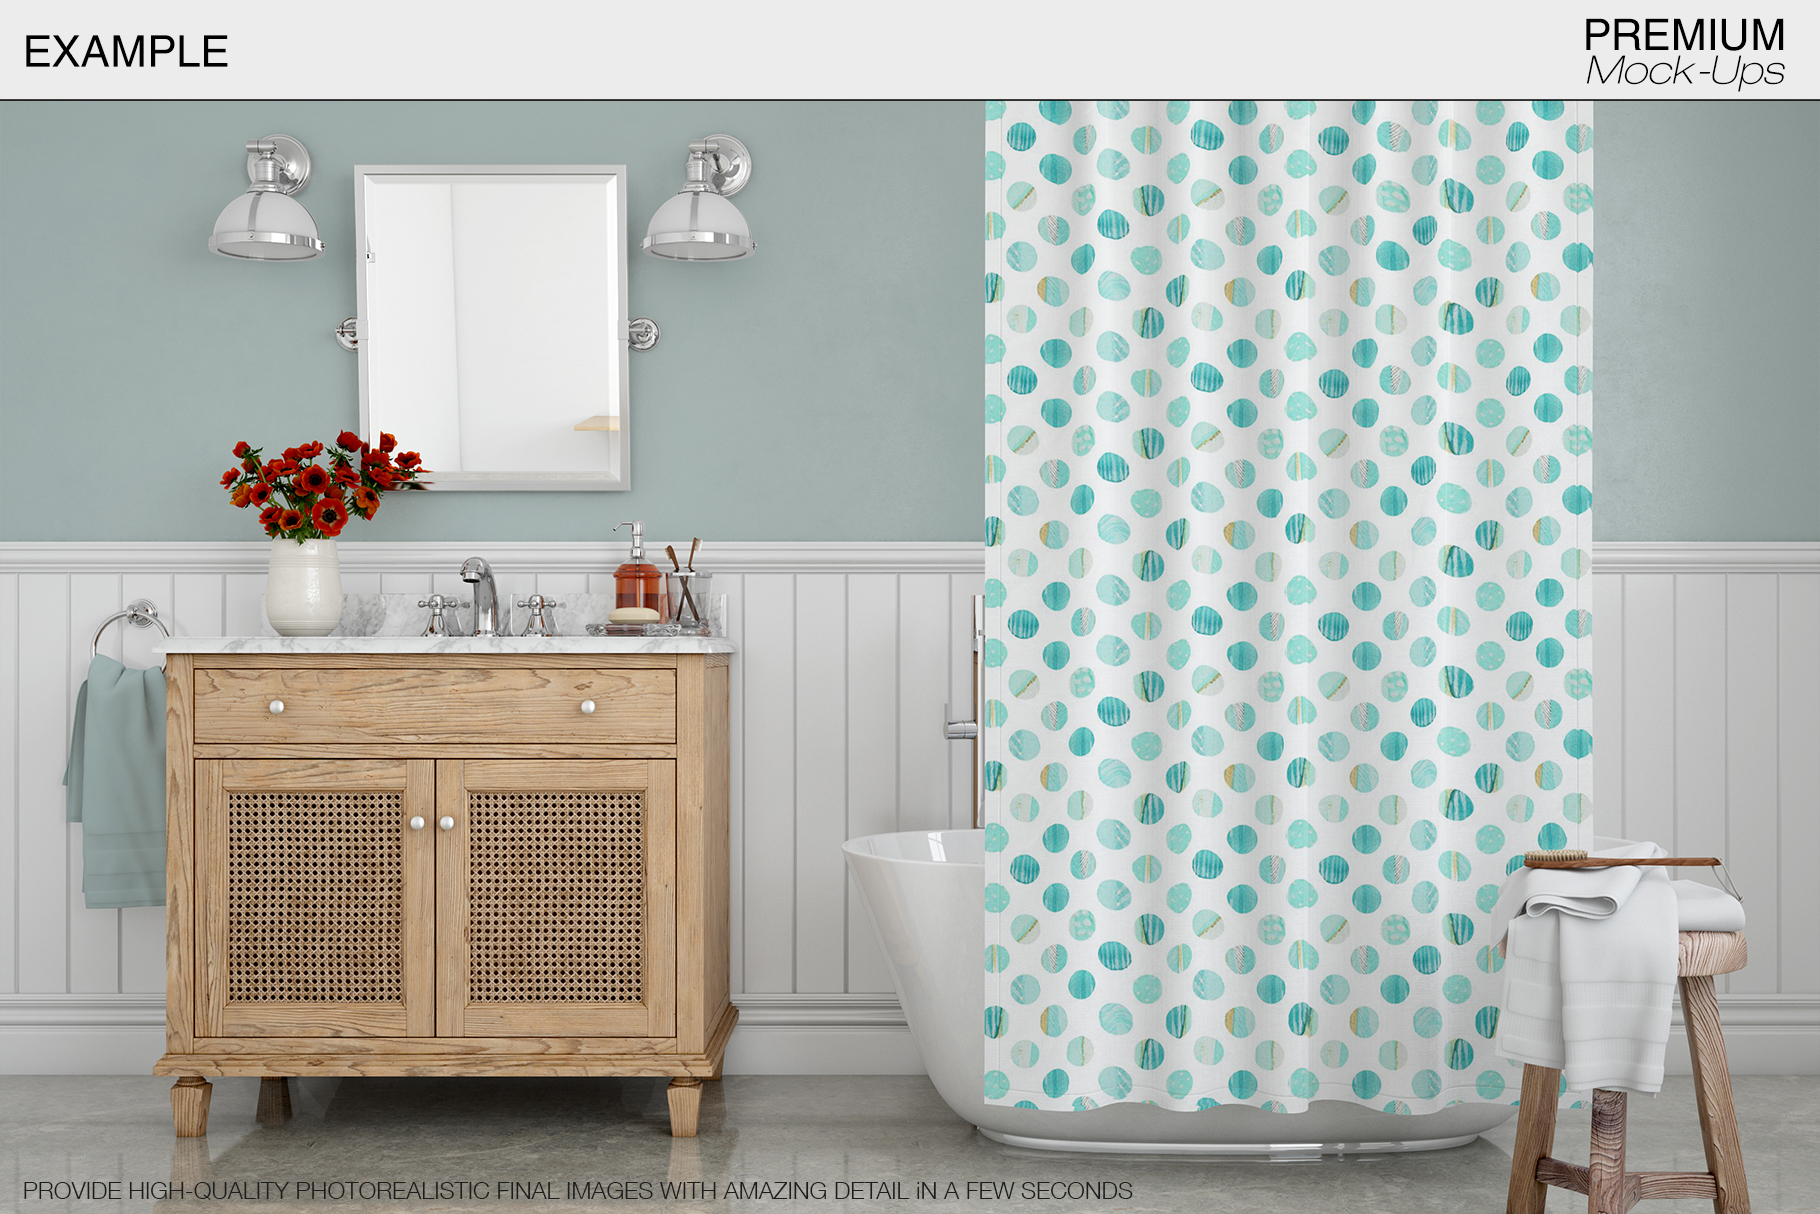 Bath Curtain Mockup Pack example image 8